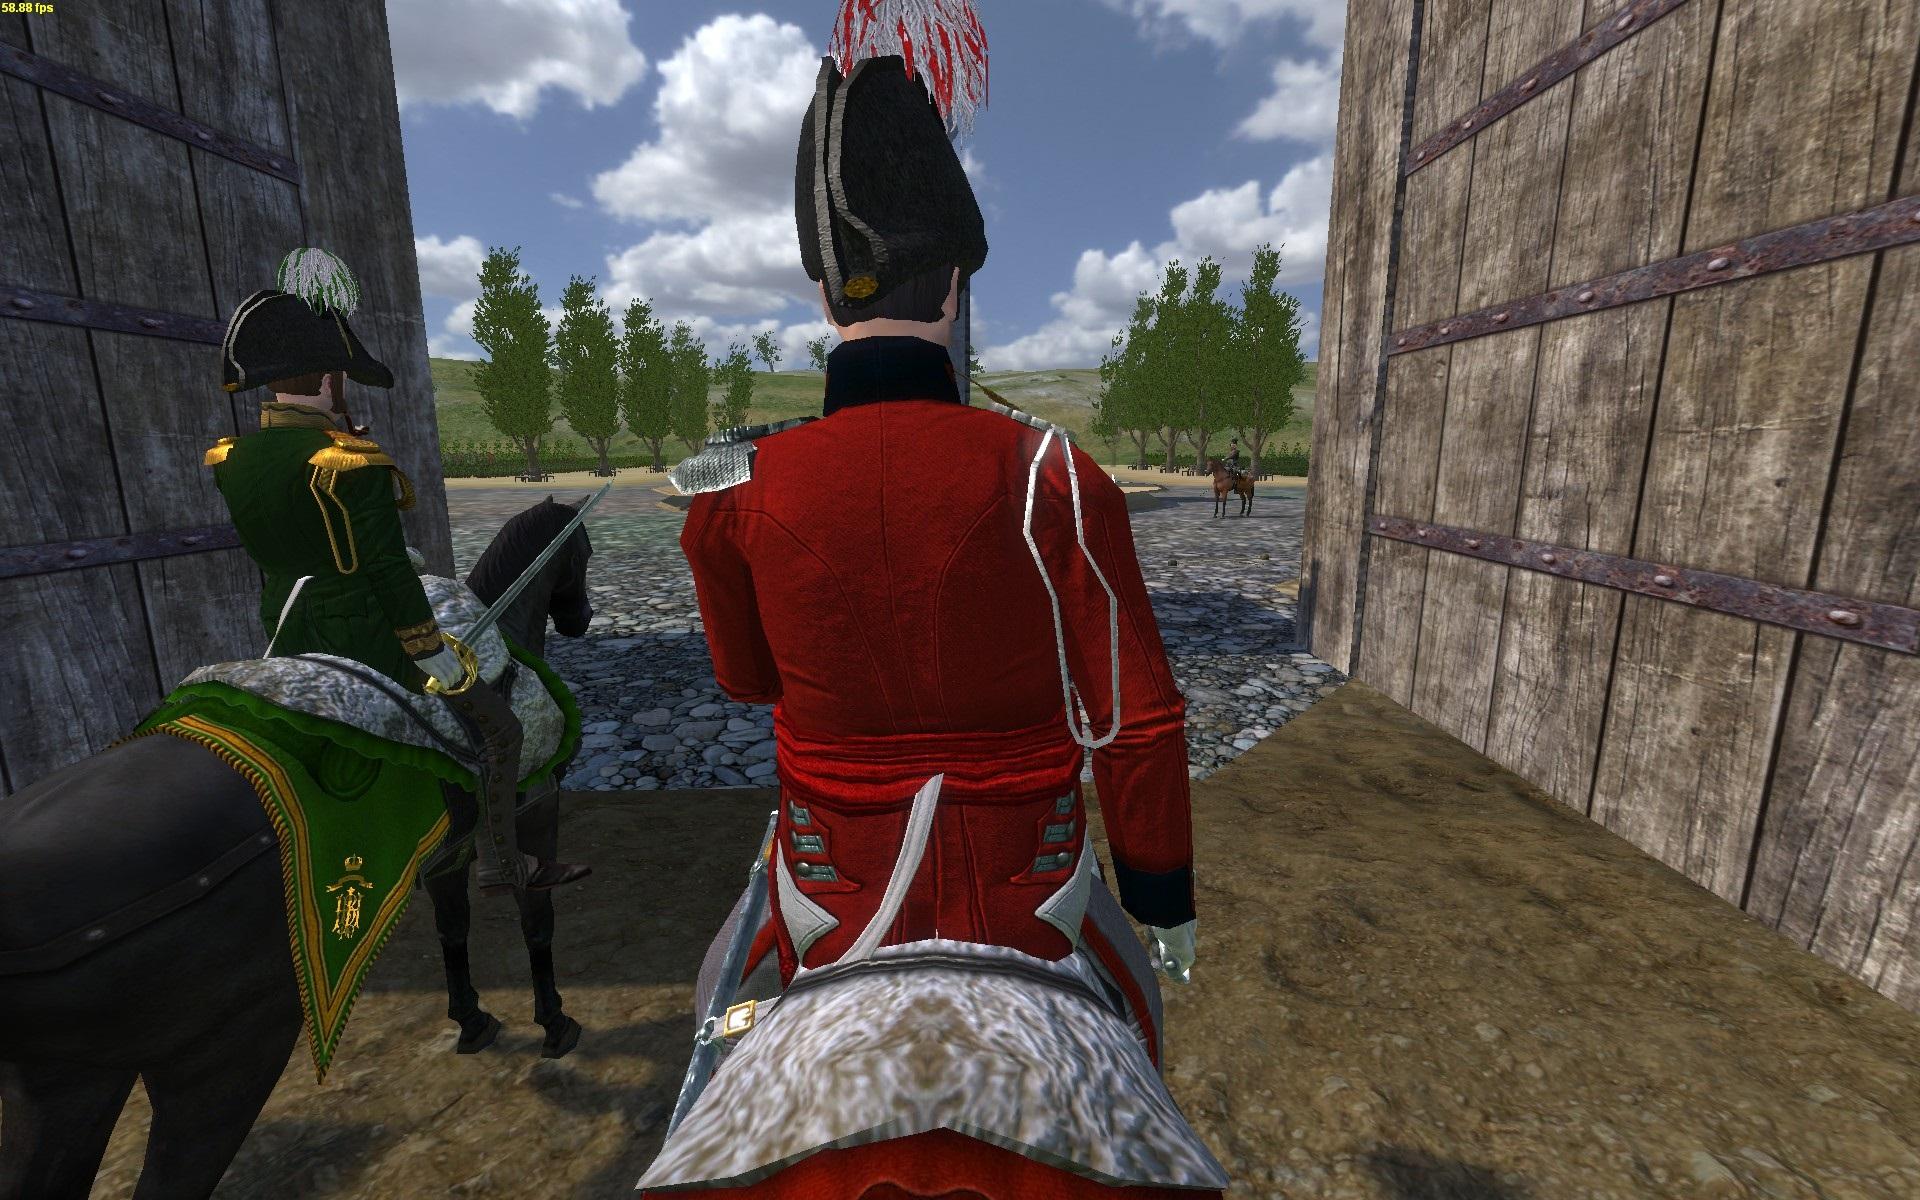 Lieutenant-Colonel JJ zu Pferd [hinten]